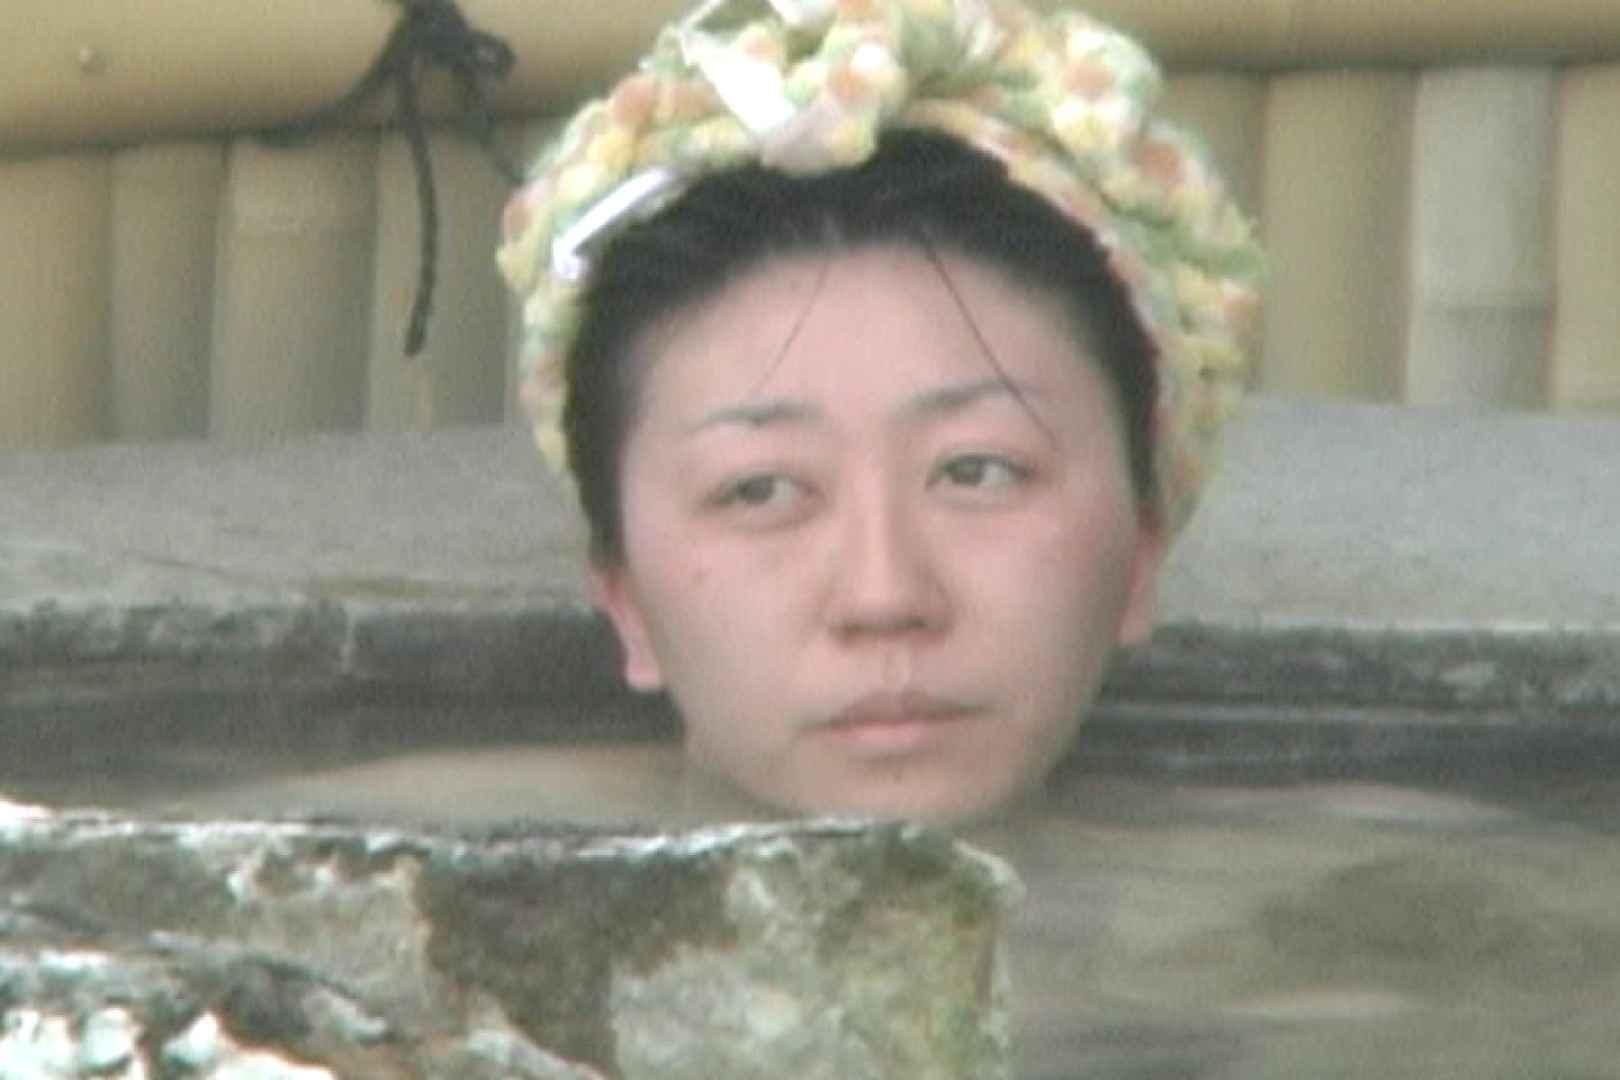 Aquaな露天風呂Vol.594 盗撮師作品 | 露天風呂突入  79pic 52